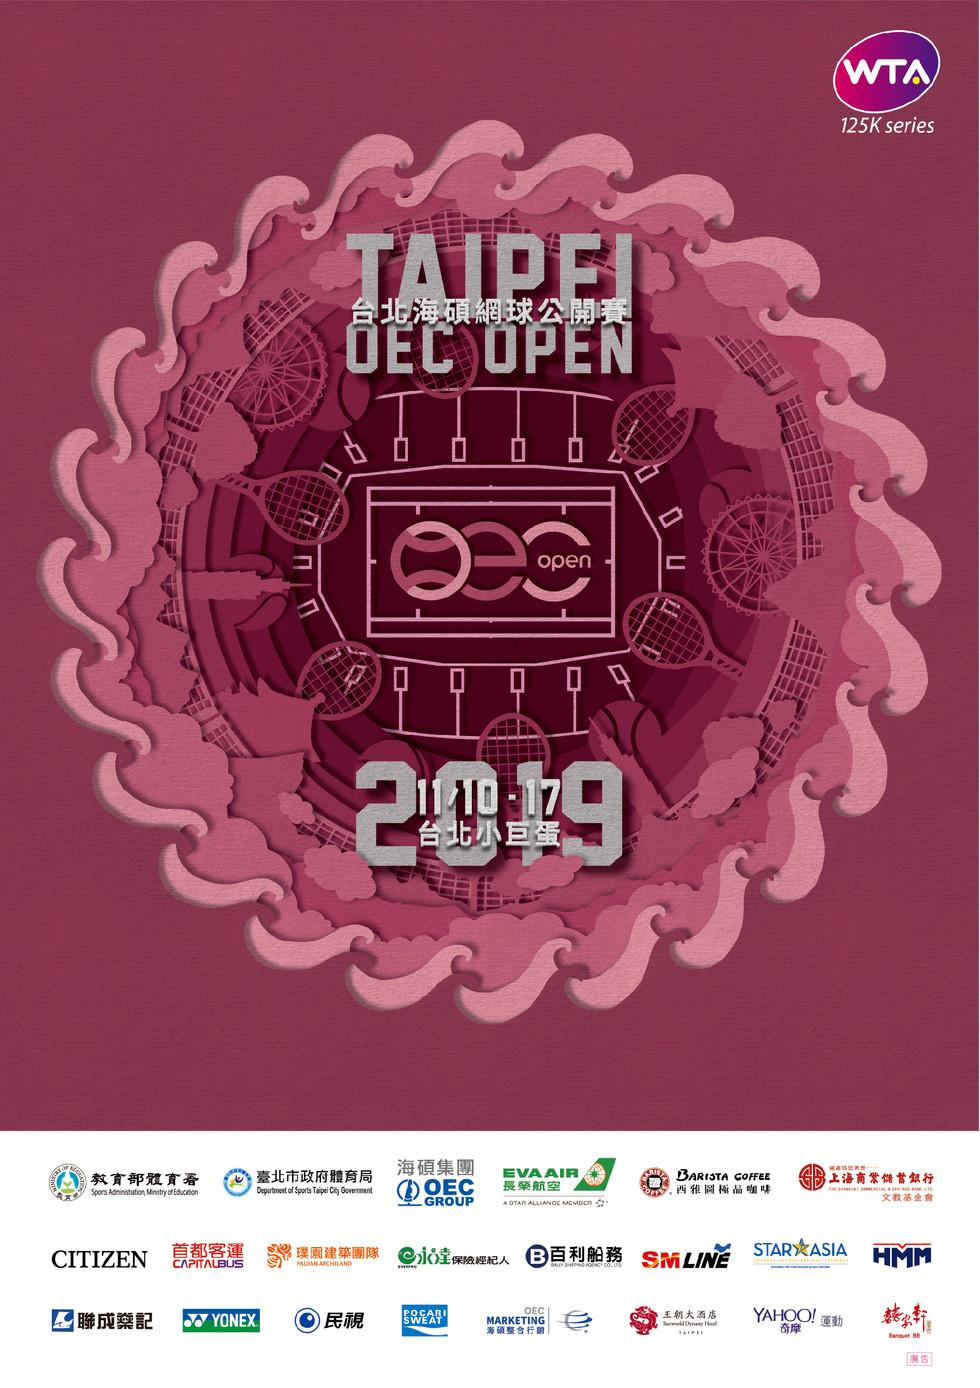 2019WTA海報設計-台北.jpg